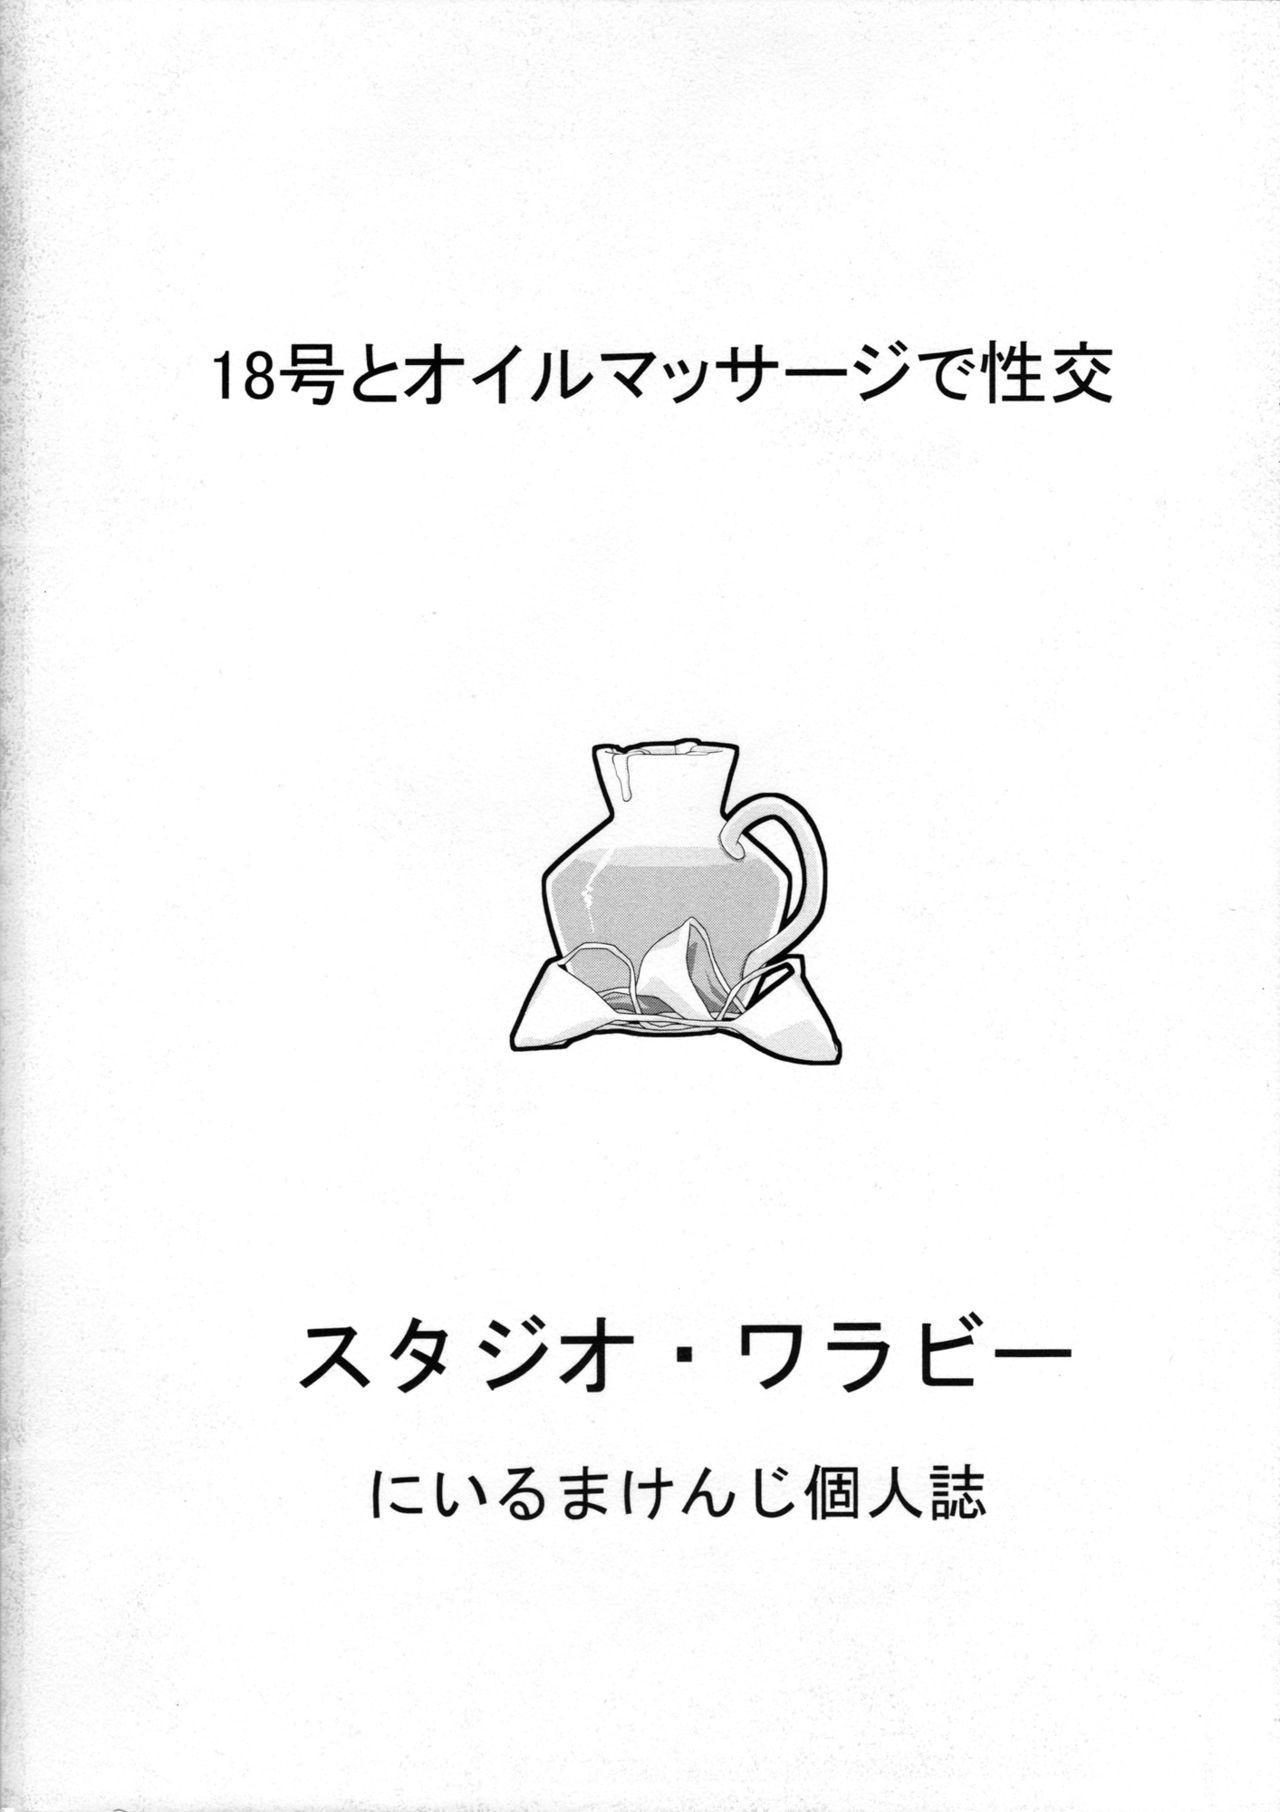 18-gou to Oil Massage de Seikou 25